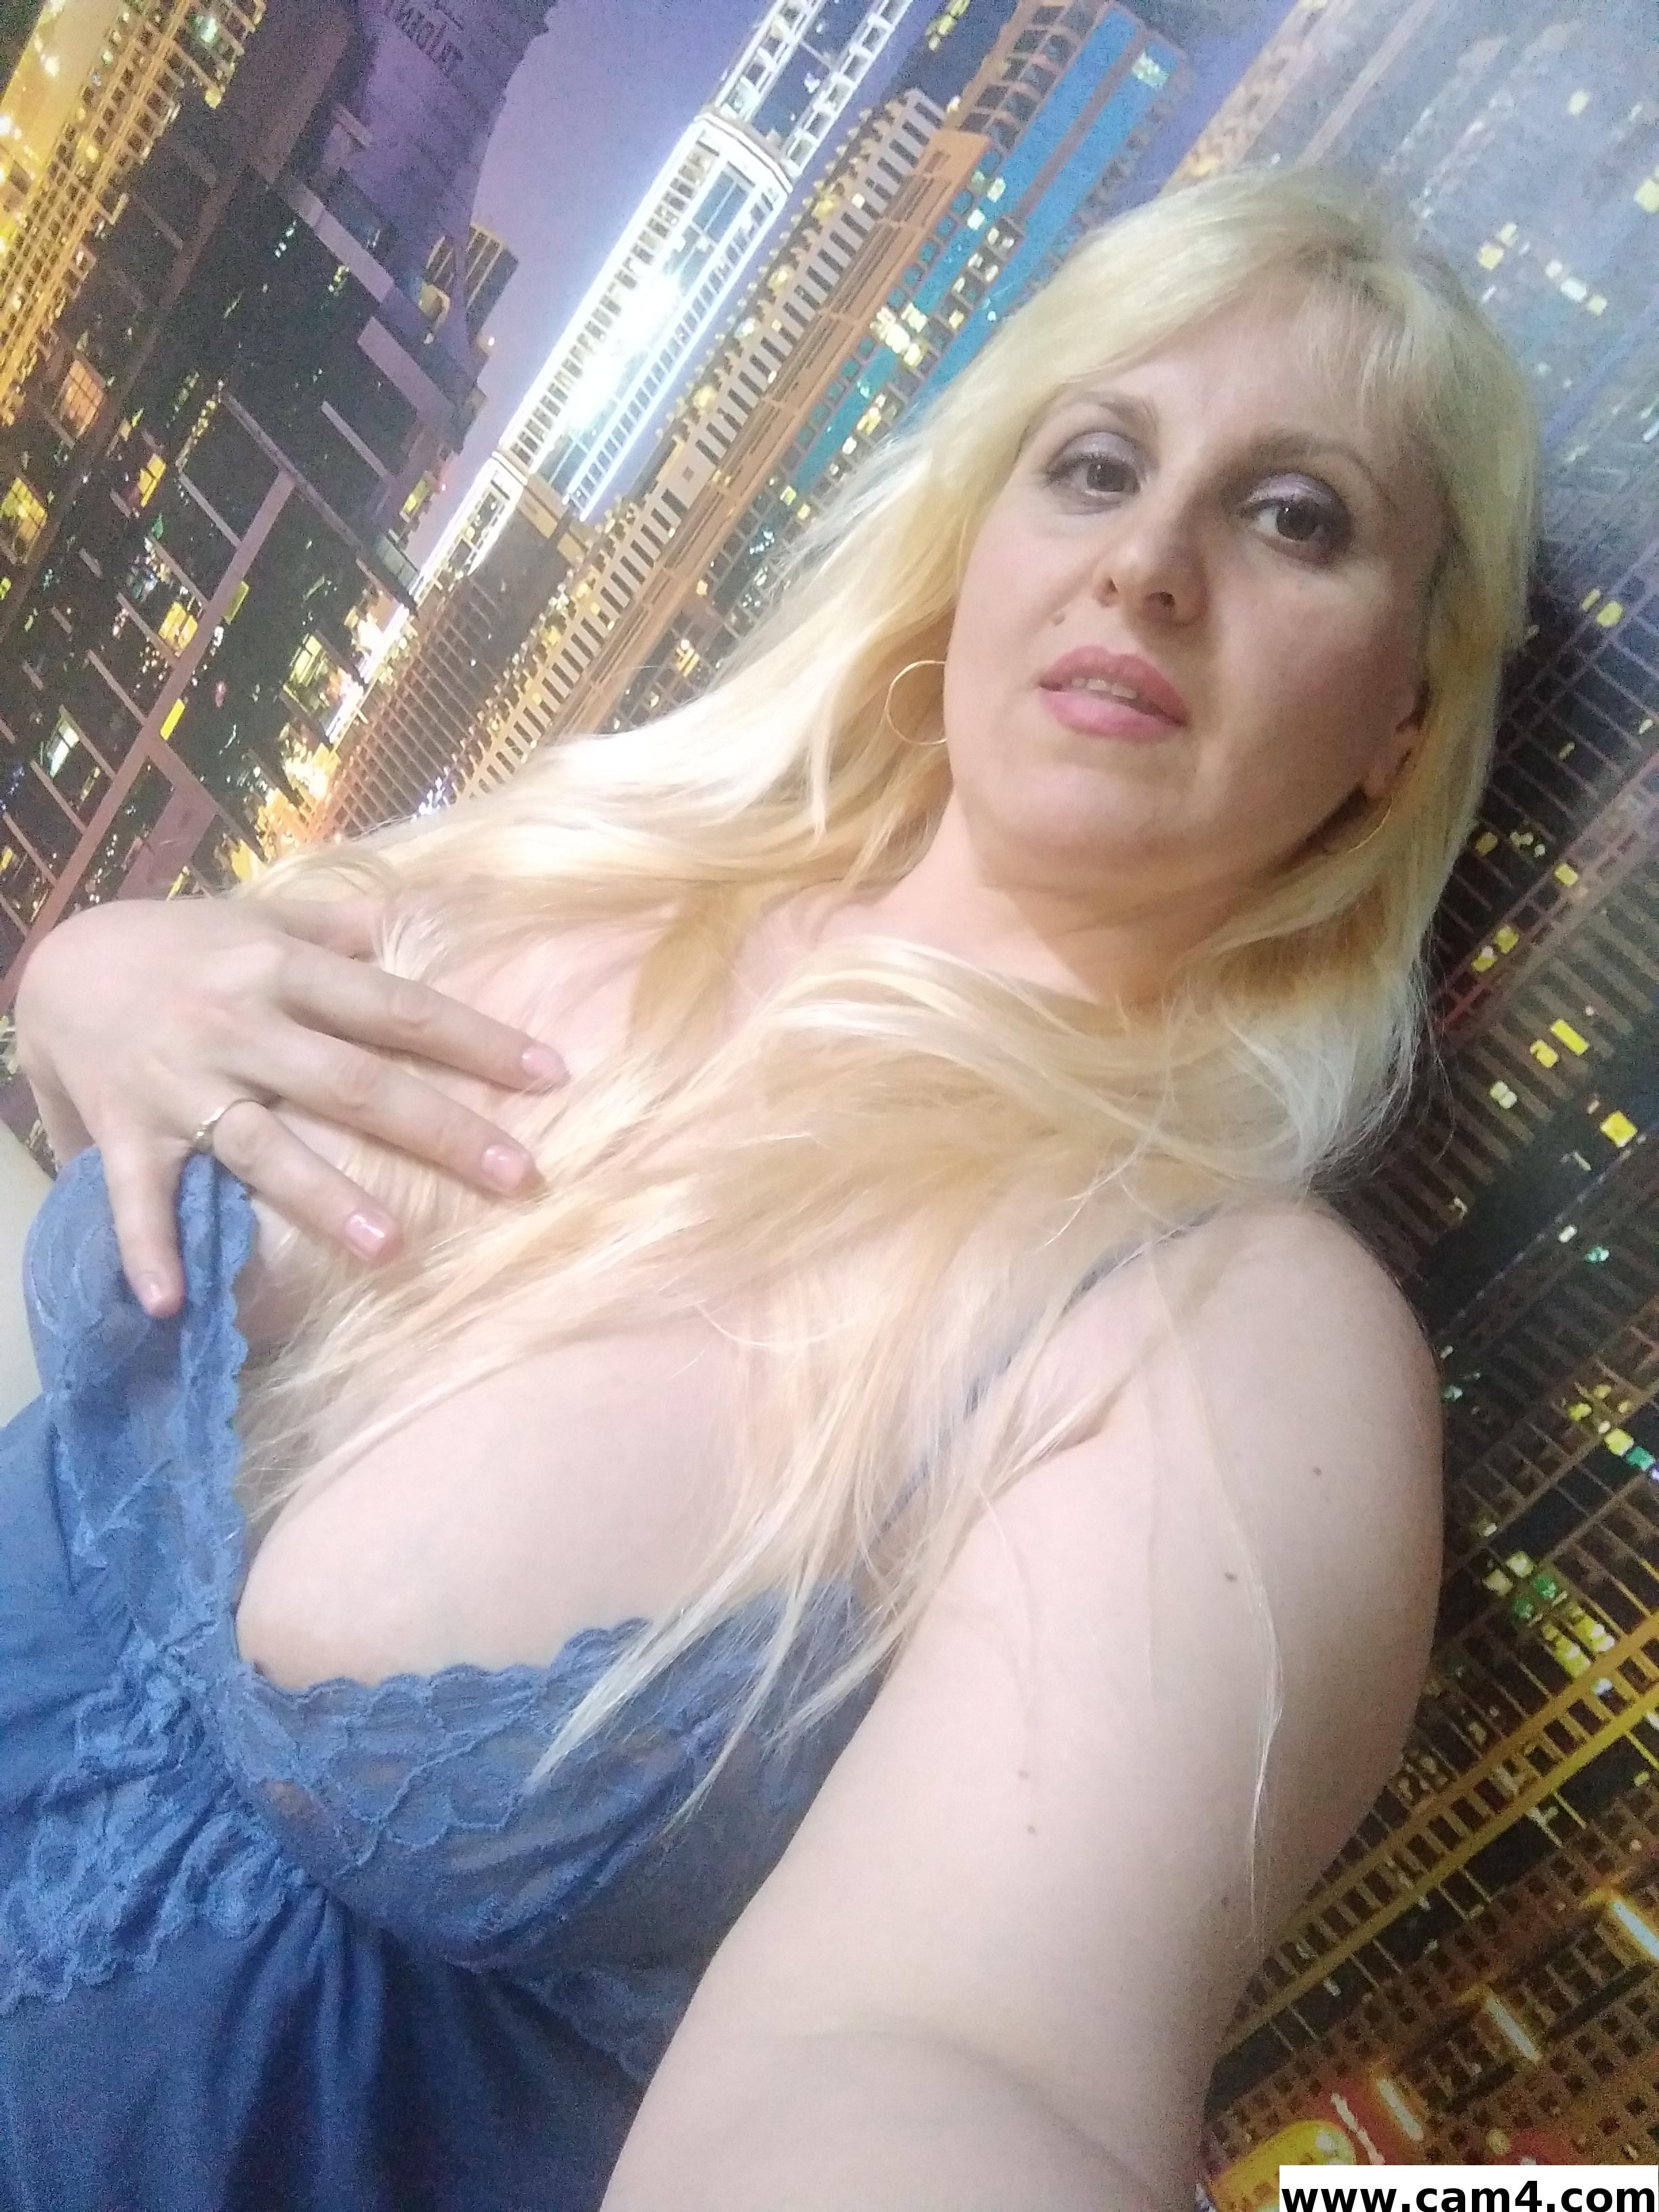 Blondabella?s=+sa+zaylvcdzrapvqv7yokg+9pbdzbguxw38xtwxp58=